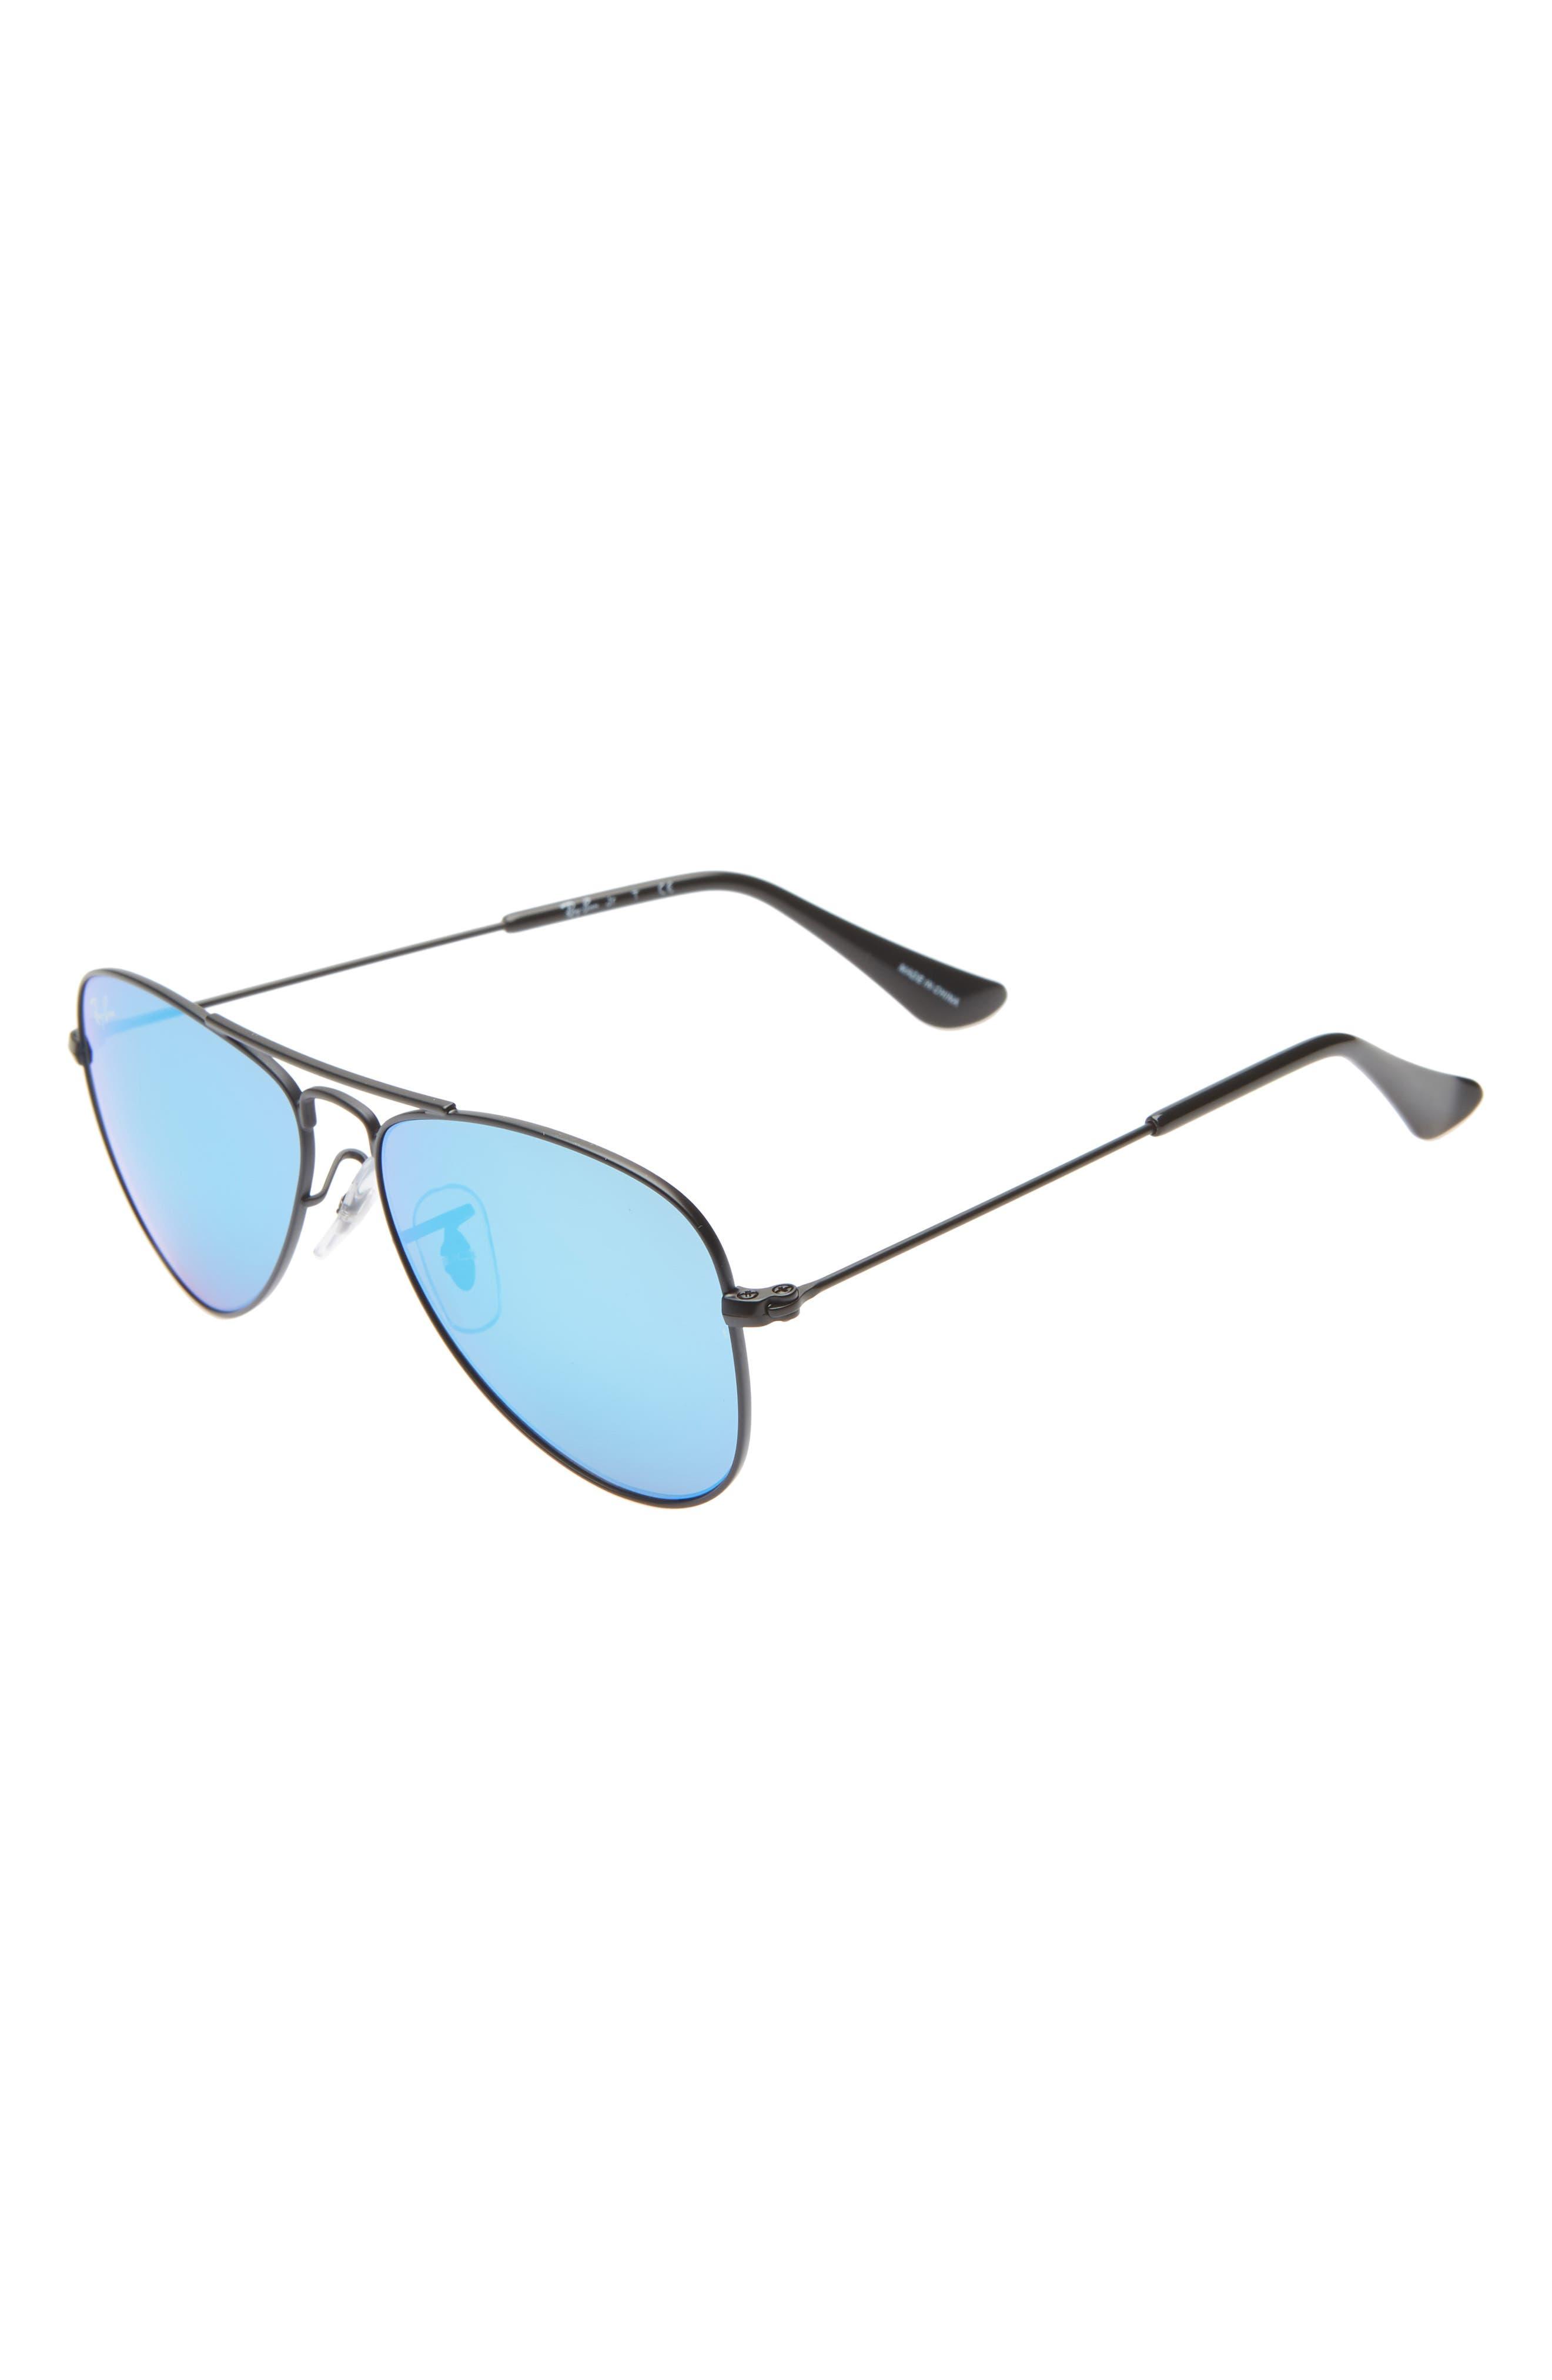 Junior 50mm Mirrored Aviator Sunglasses,                             Main thumbnail 1, color,                             001